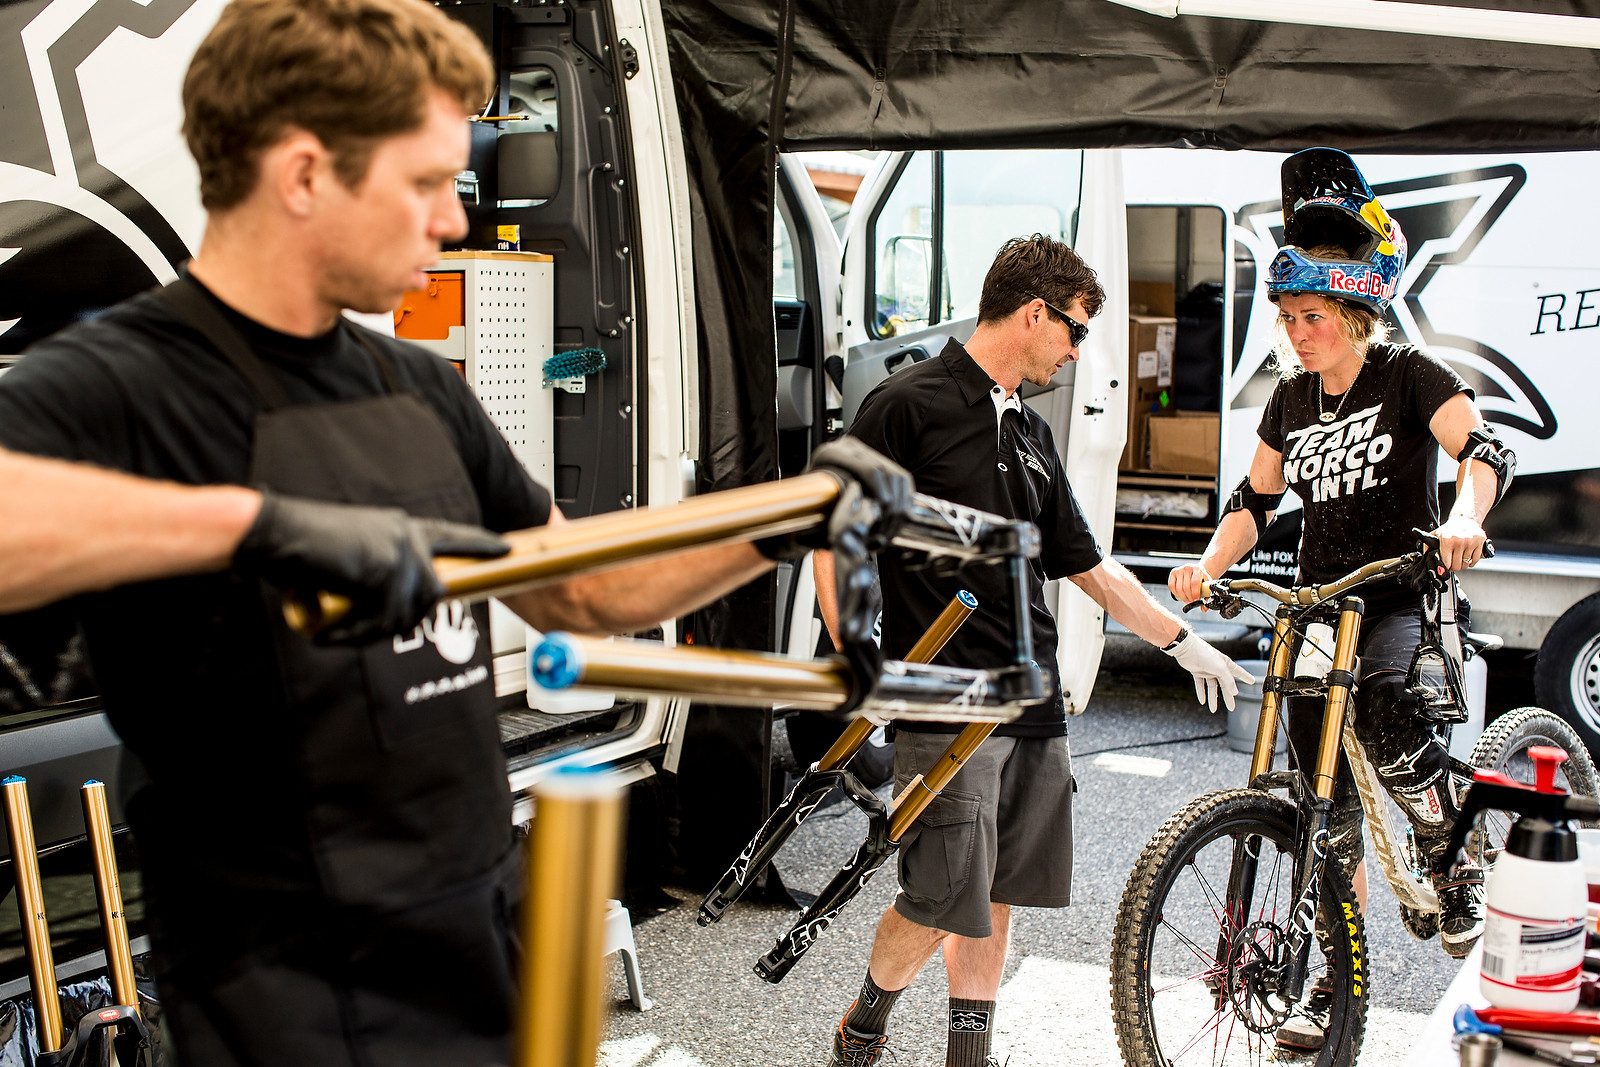 Jill Kintner Preps her Bike for Andorra - PIT BITS: 2013 Andorra World Cup - Mountain Biking Pictures - Vital MTB